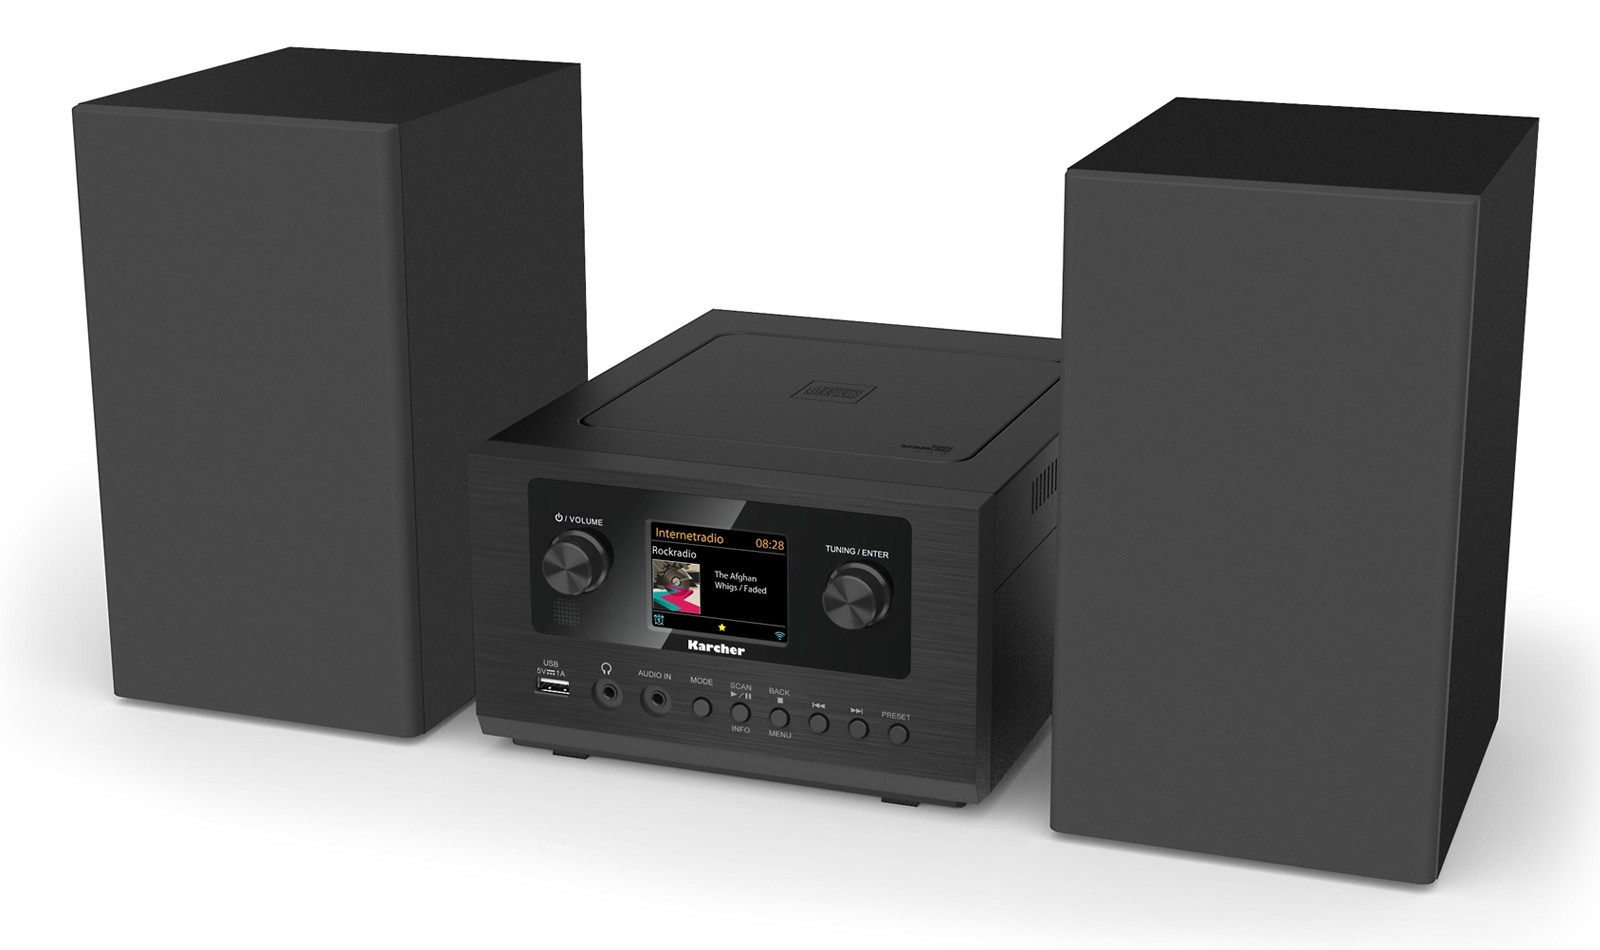 Karcher MC 6490DI DAB+/UKW, W-LAN-Internetradio, CD/MP3 Player, Bluetooth, Stereo -Radio